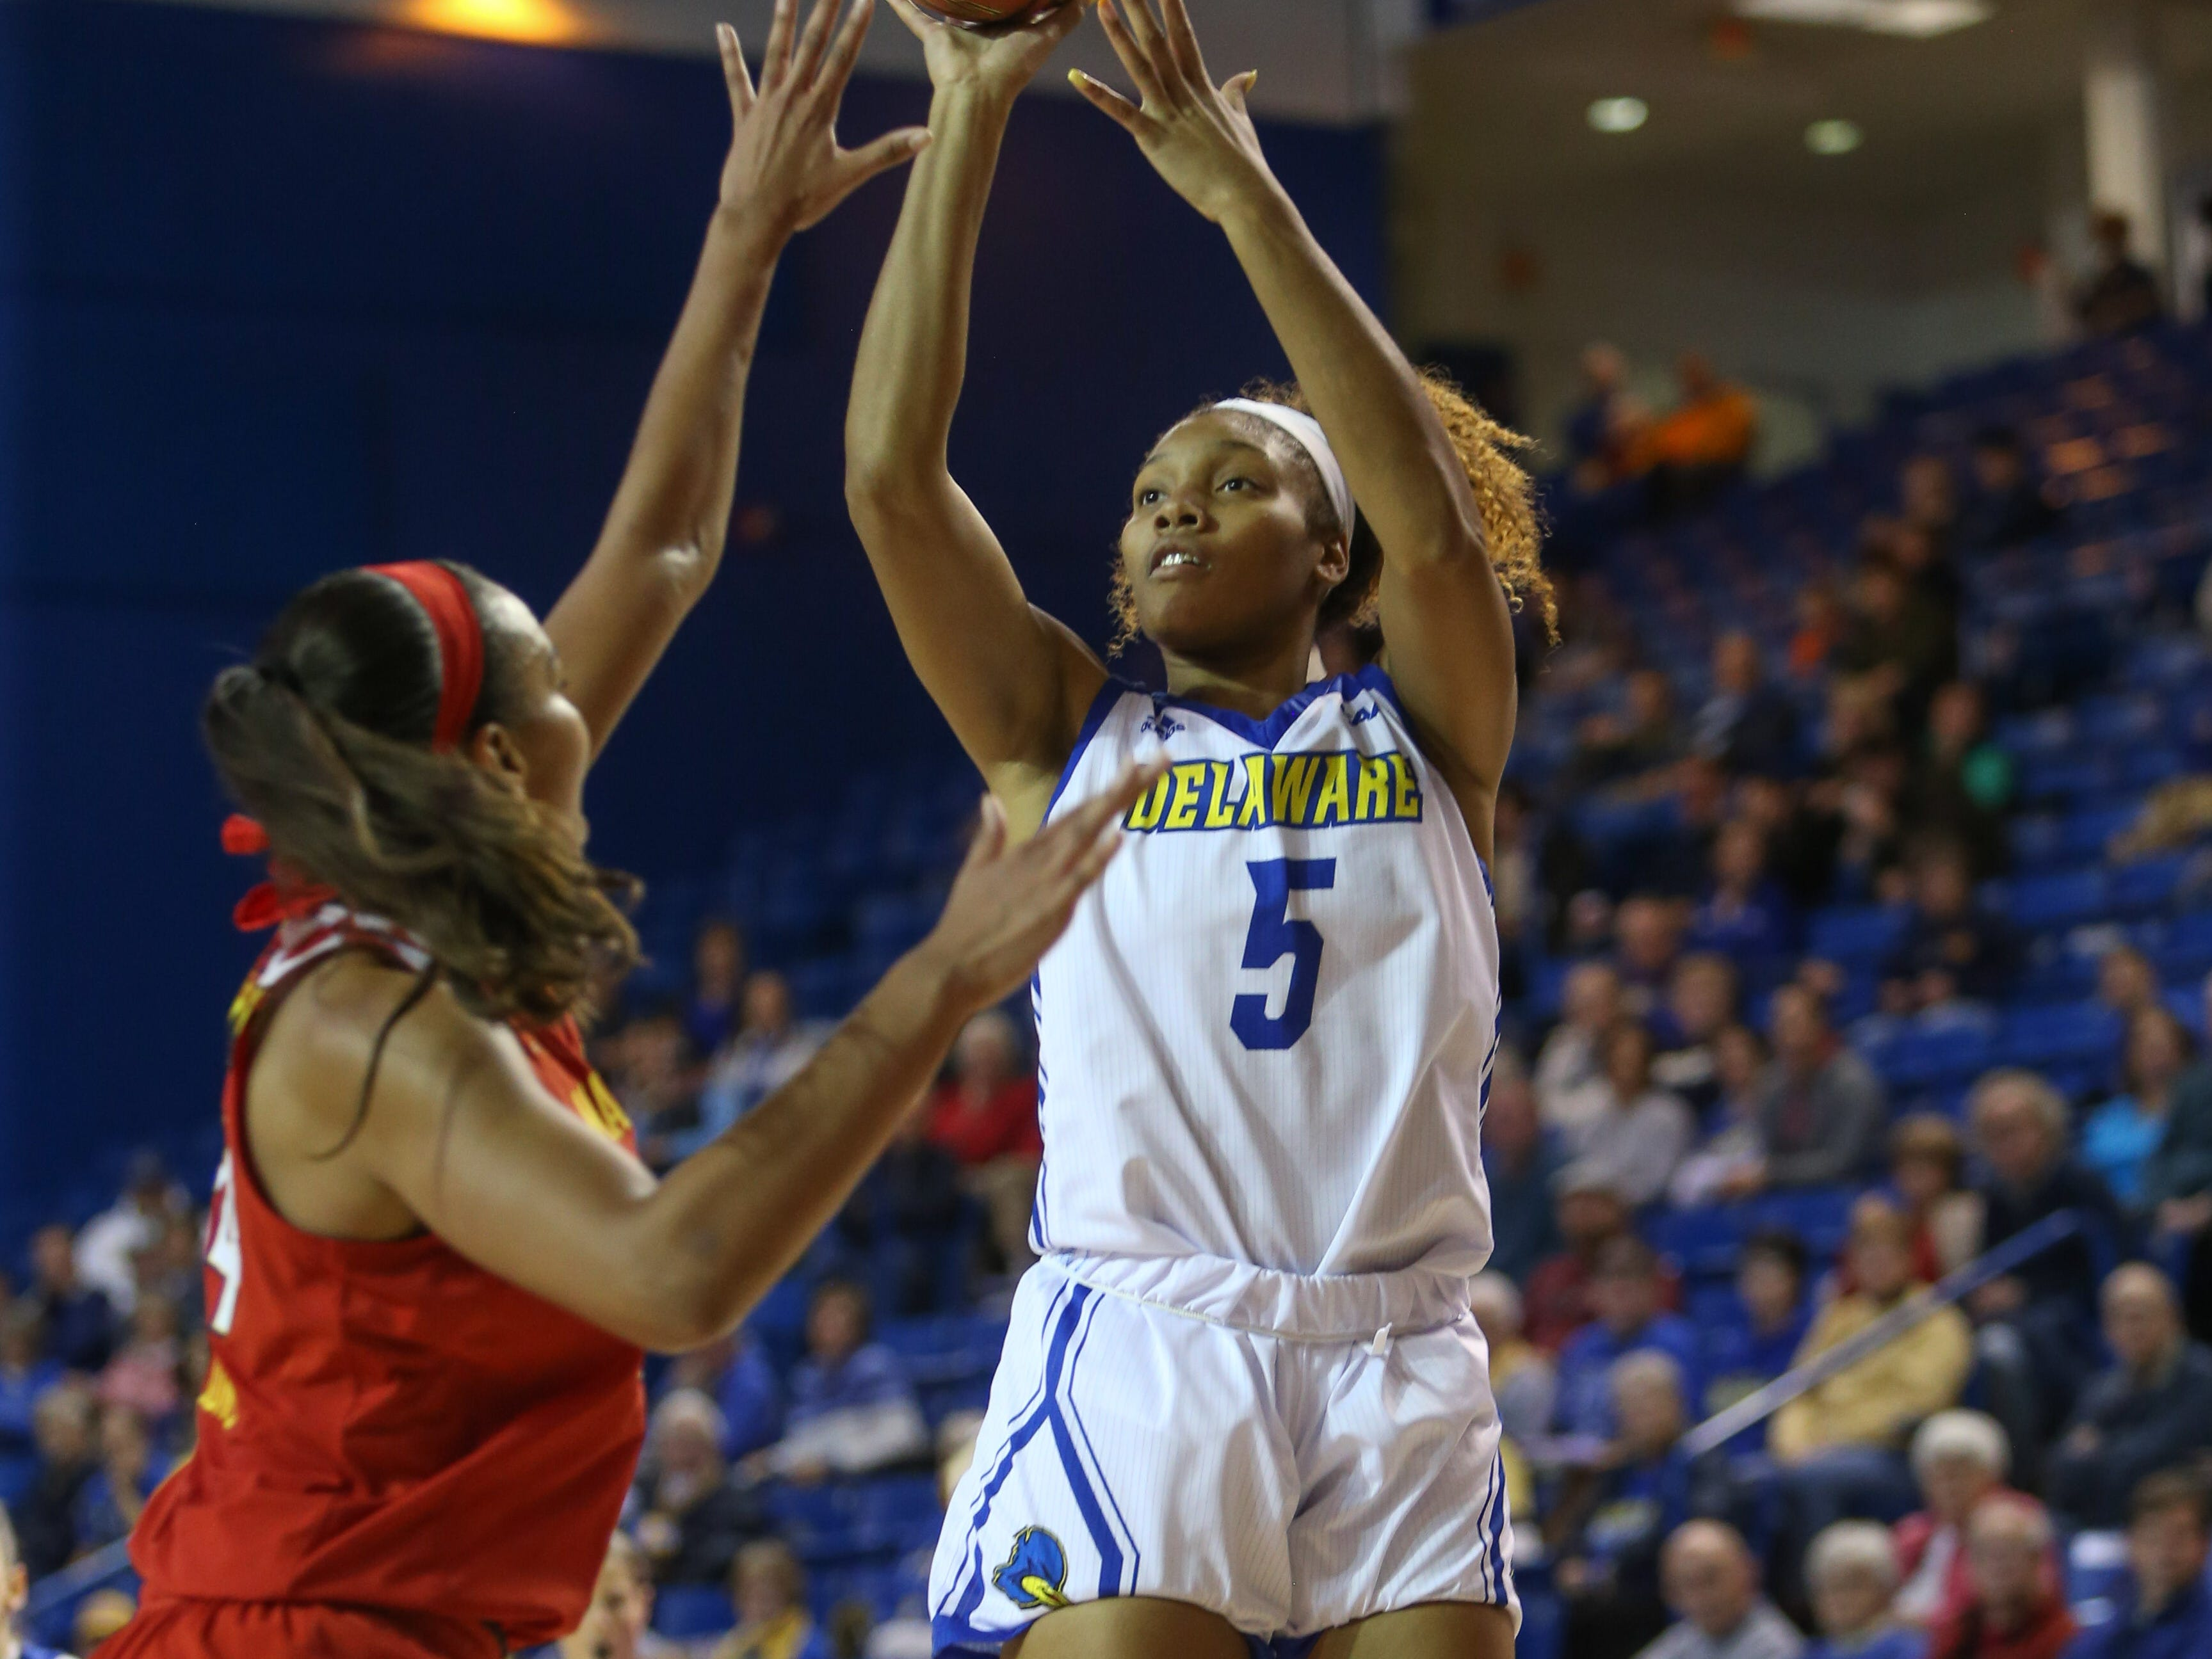 Delaware forward Makeda Nicholas rises up for two. The University of Delaware women's basketball team takes on No. 5 University of Maryland at the Bob Carpenter Center Thursday.